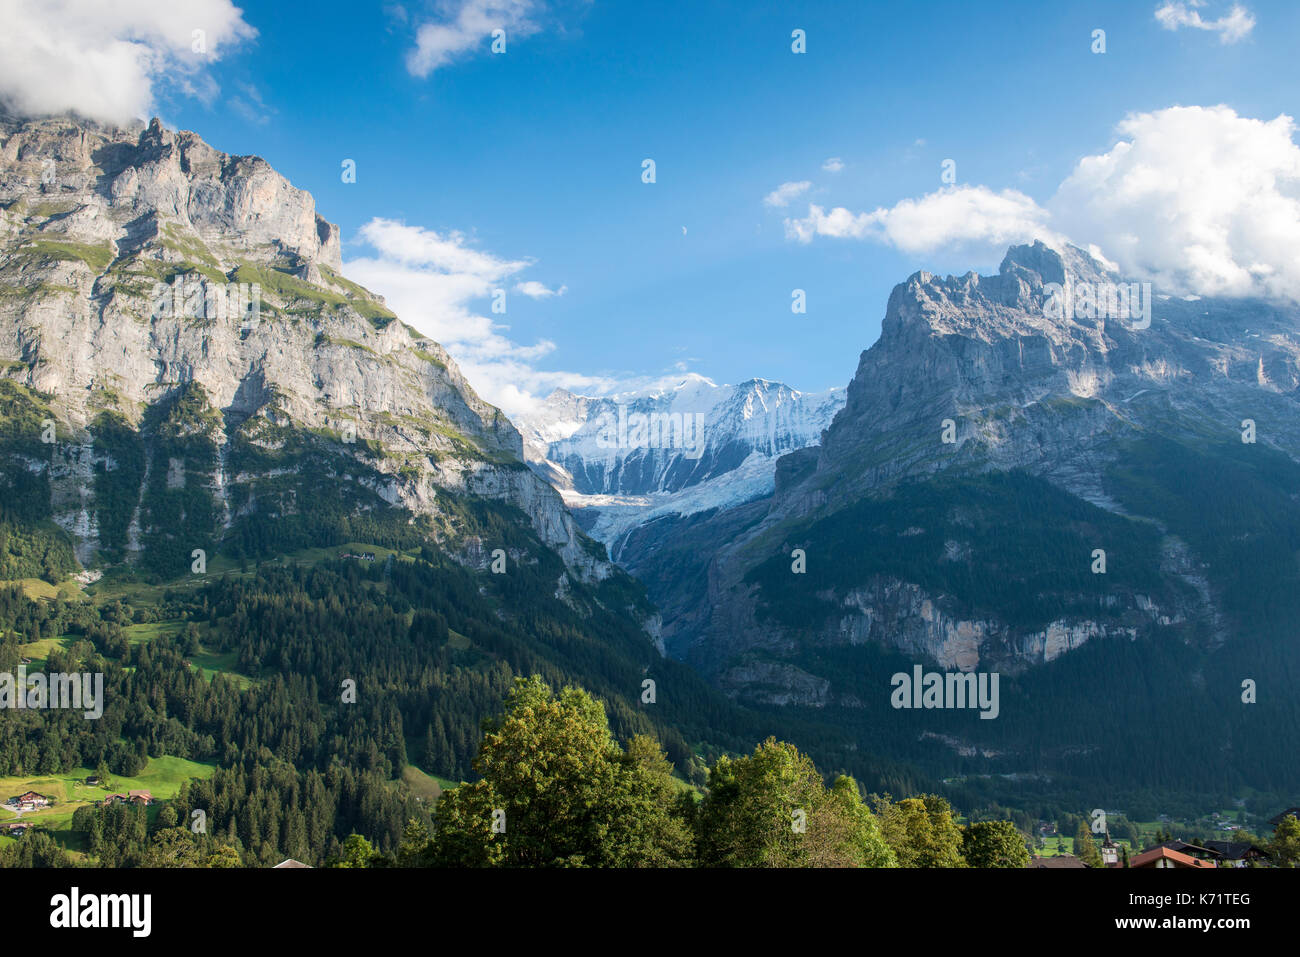 View into the valley of Untere Grindelwald Gletscher (glacier), GRindelwald, Switzerland - Stock Image